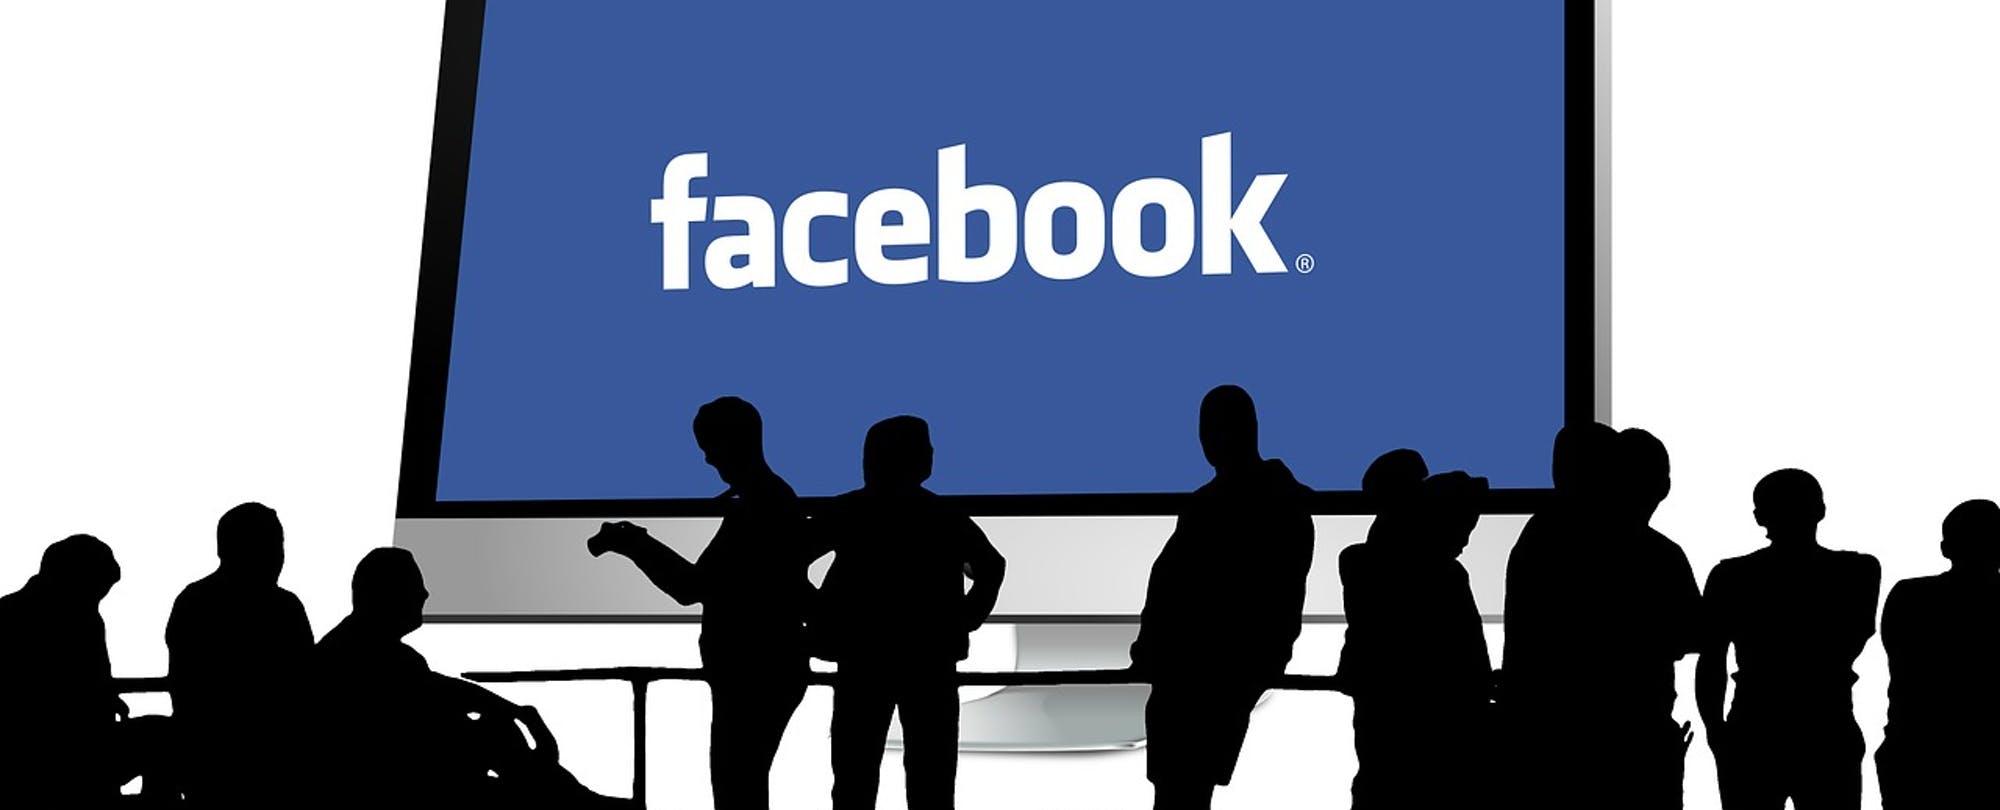 Facebook Schools MOOCs on Engagement